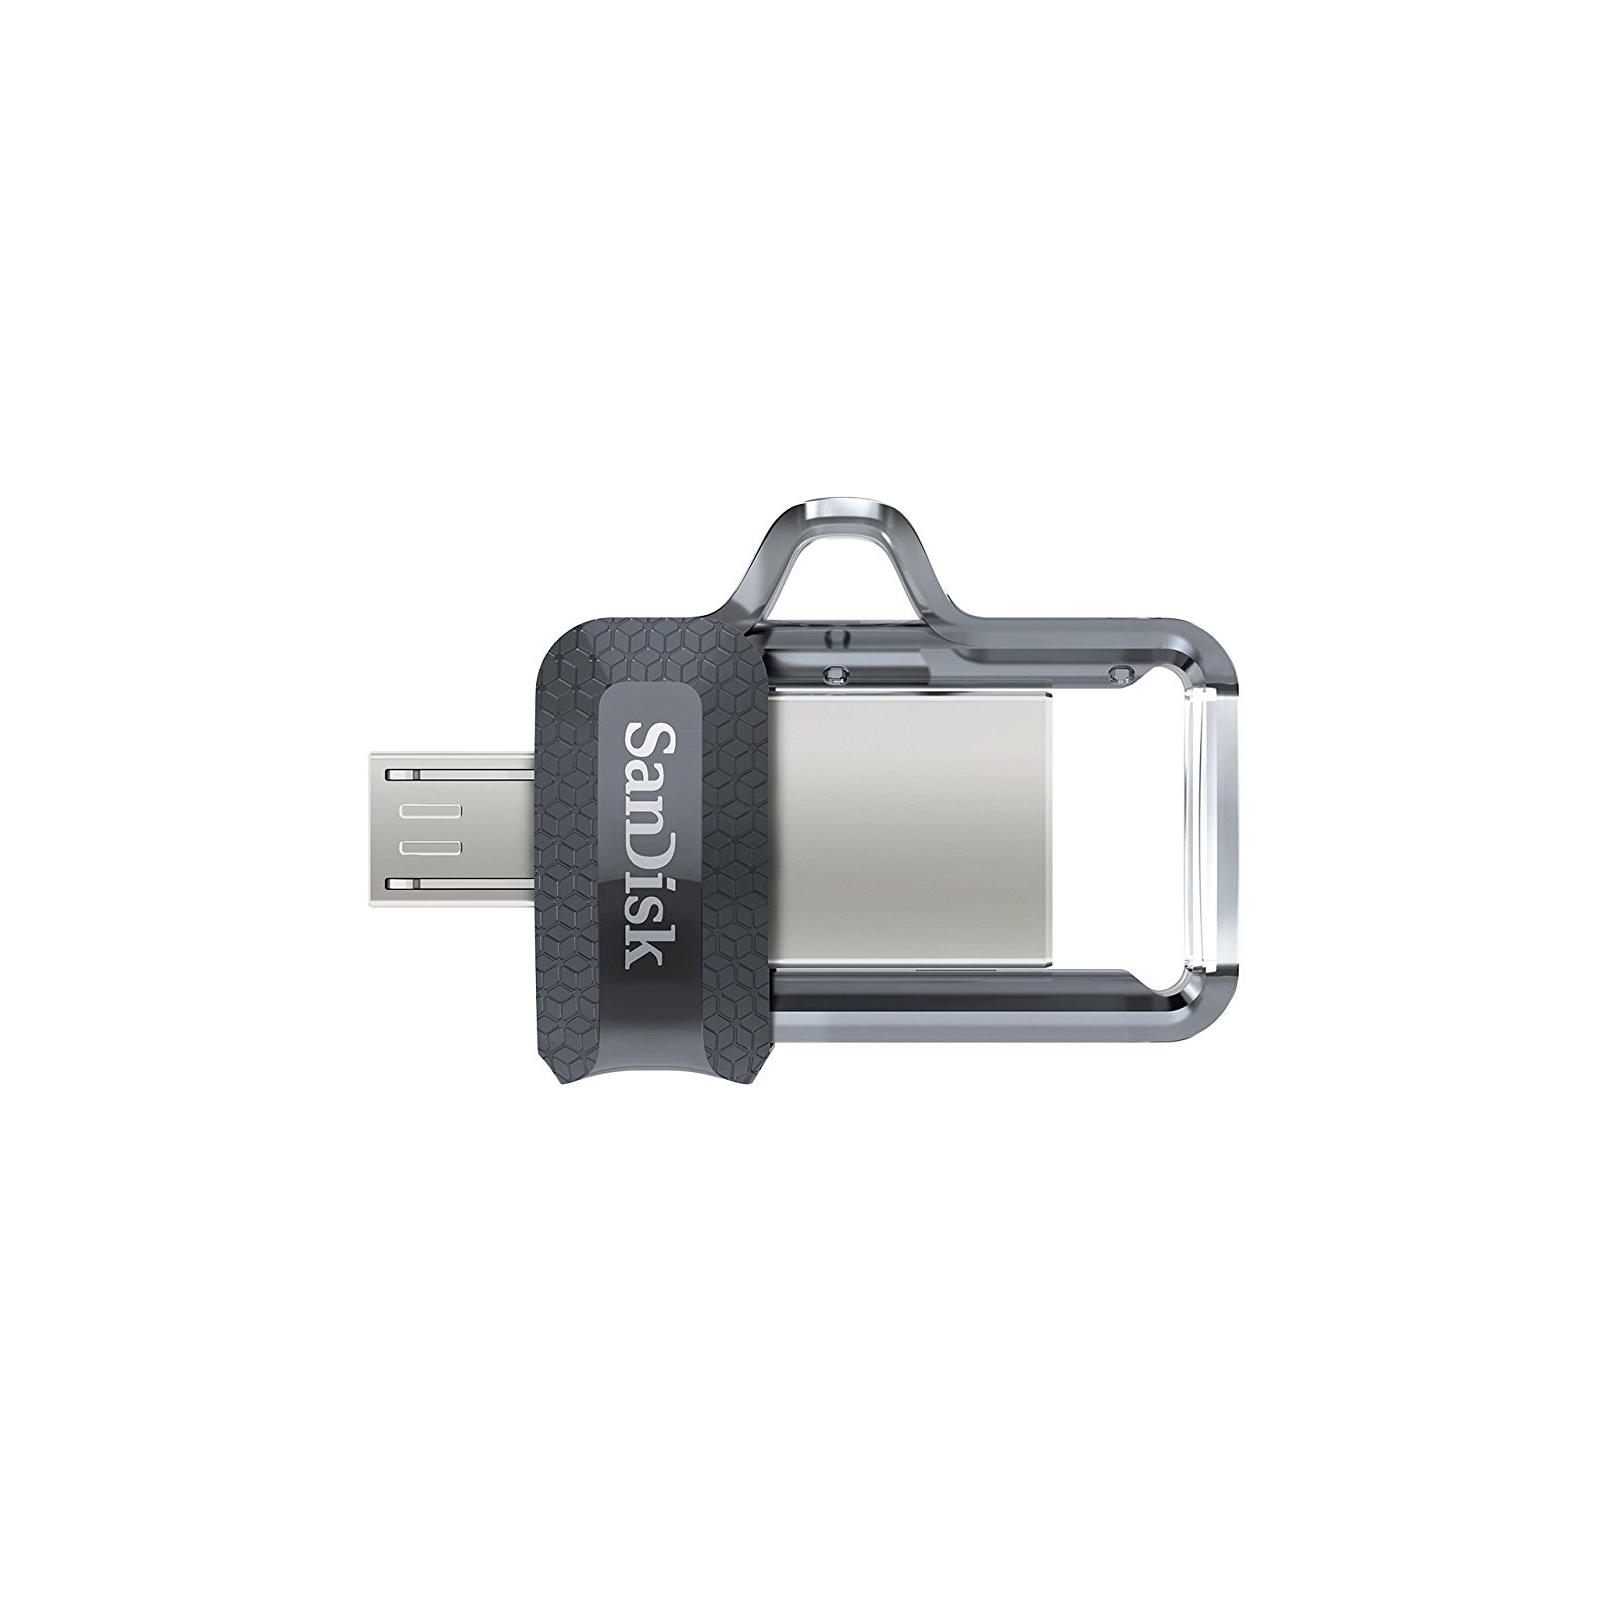 USB флеш накопитель SanDisk 64GB Ultra Dual Black USB 3.0 OTG (SDDD3-064G-G46) изображение 2